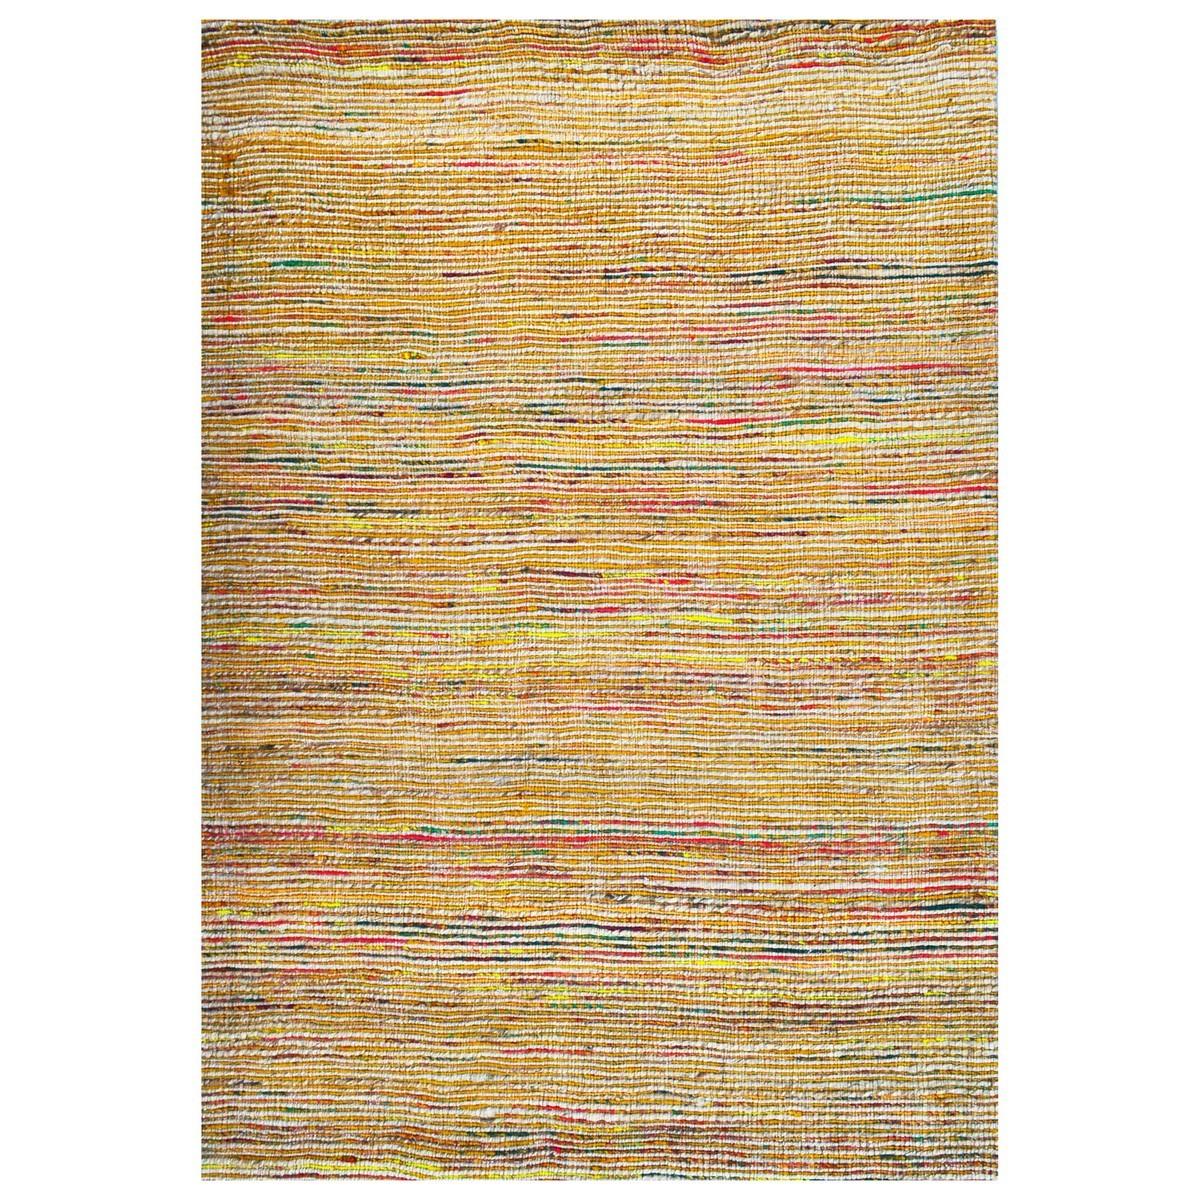 Kerla Horizon Handwoven Silk & Jute Rug, 230x160cm, Natural / Gold